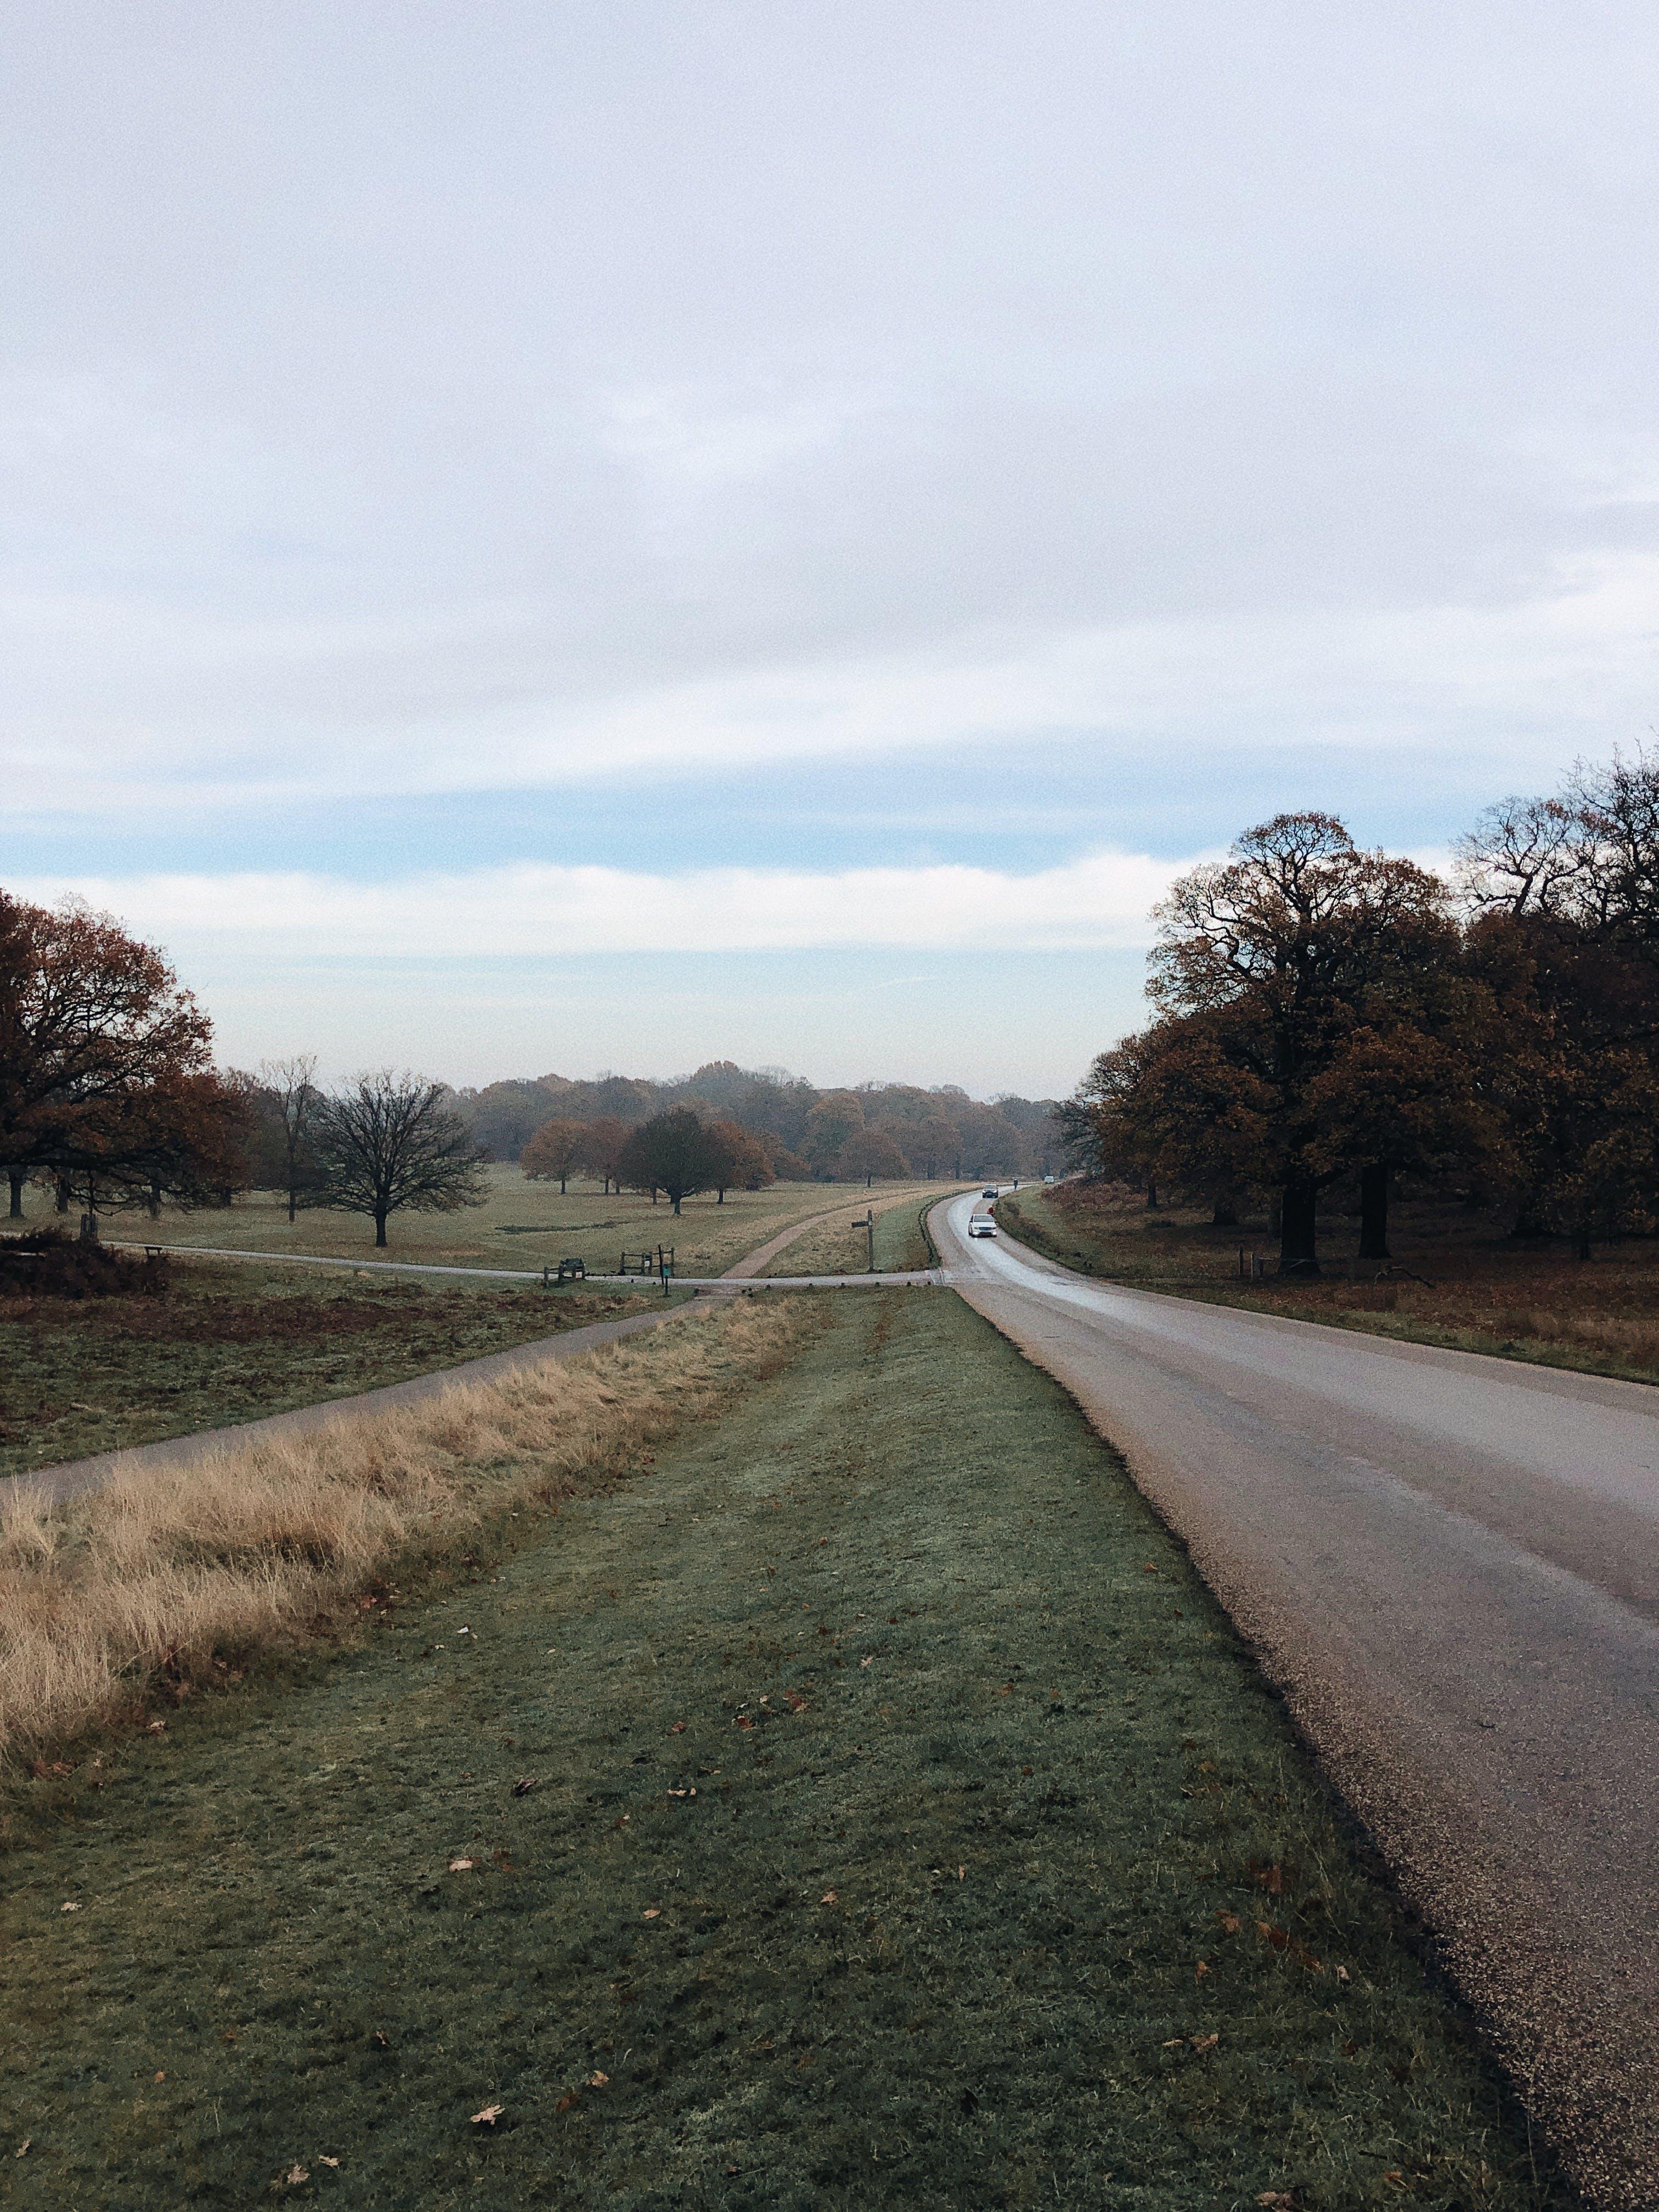 Road Near Green Grass Field